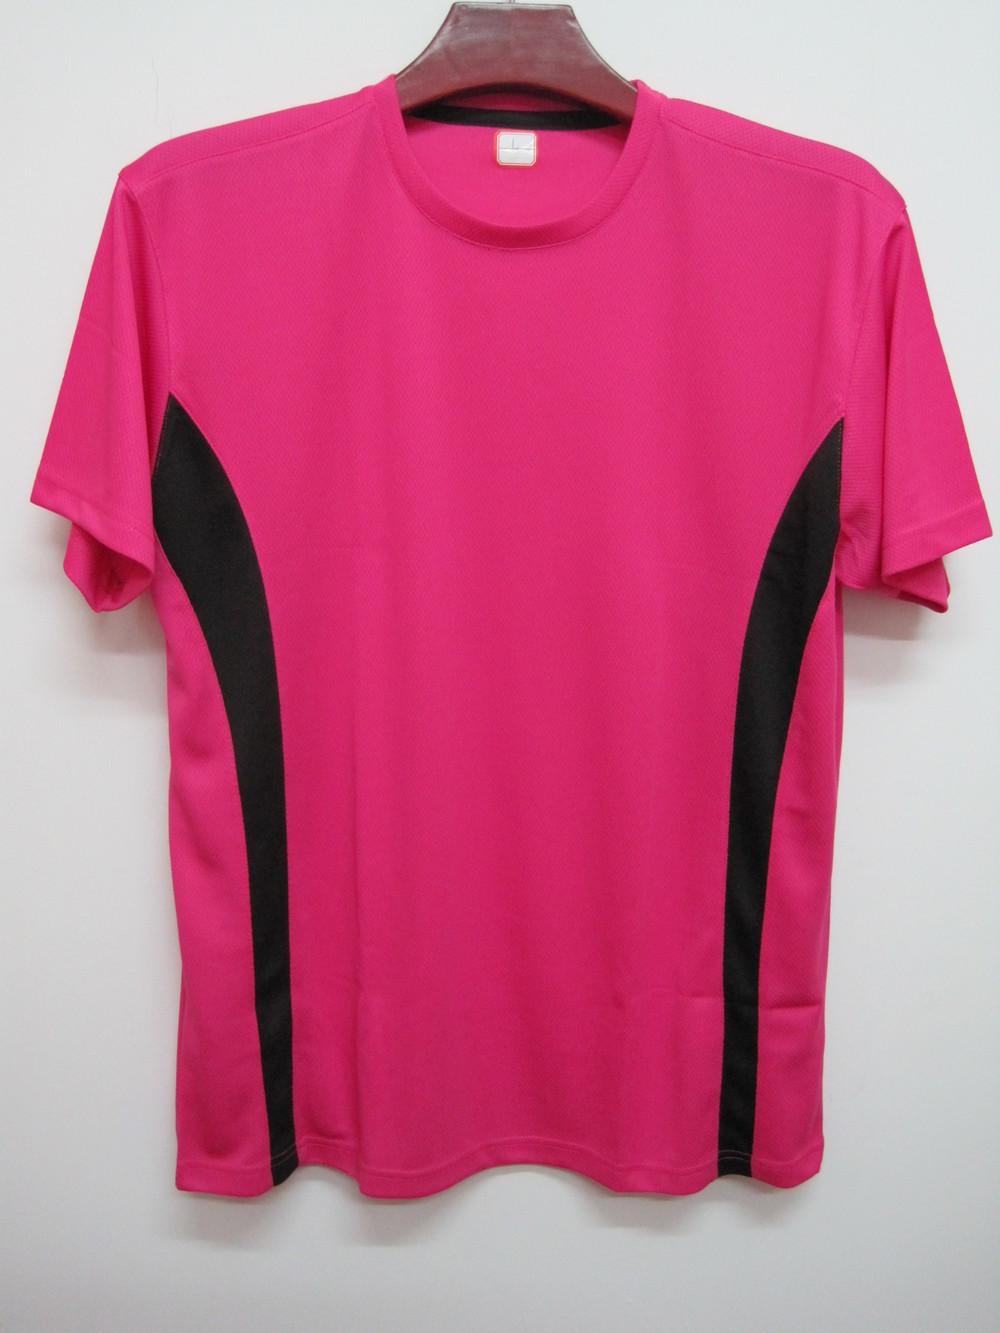 Dri fit polyester tshirts cheap plain dri fit tshirt mens for Dri fit t shirt design